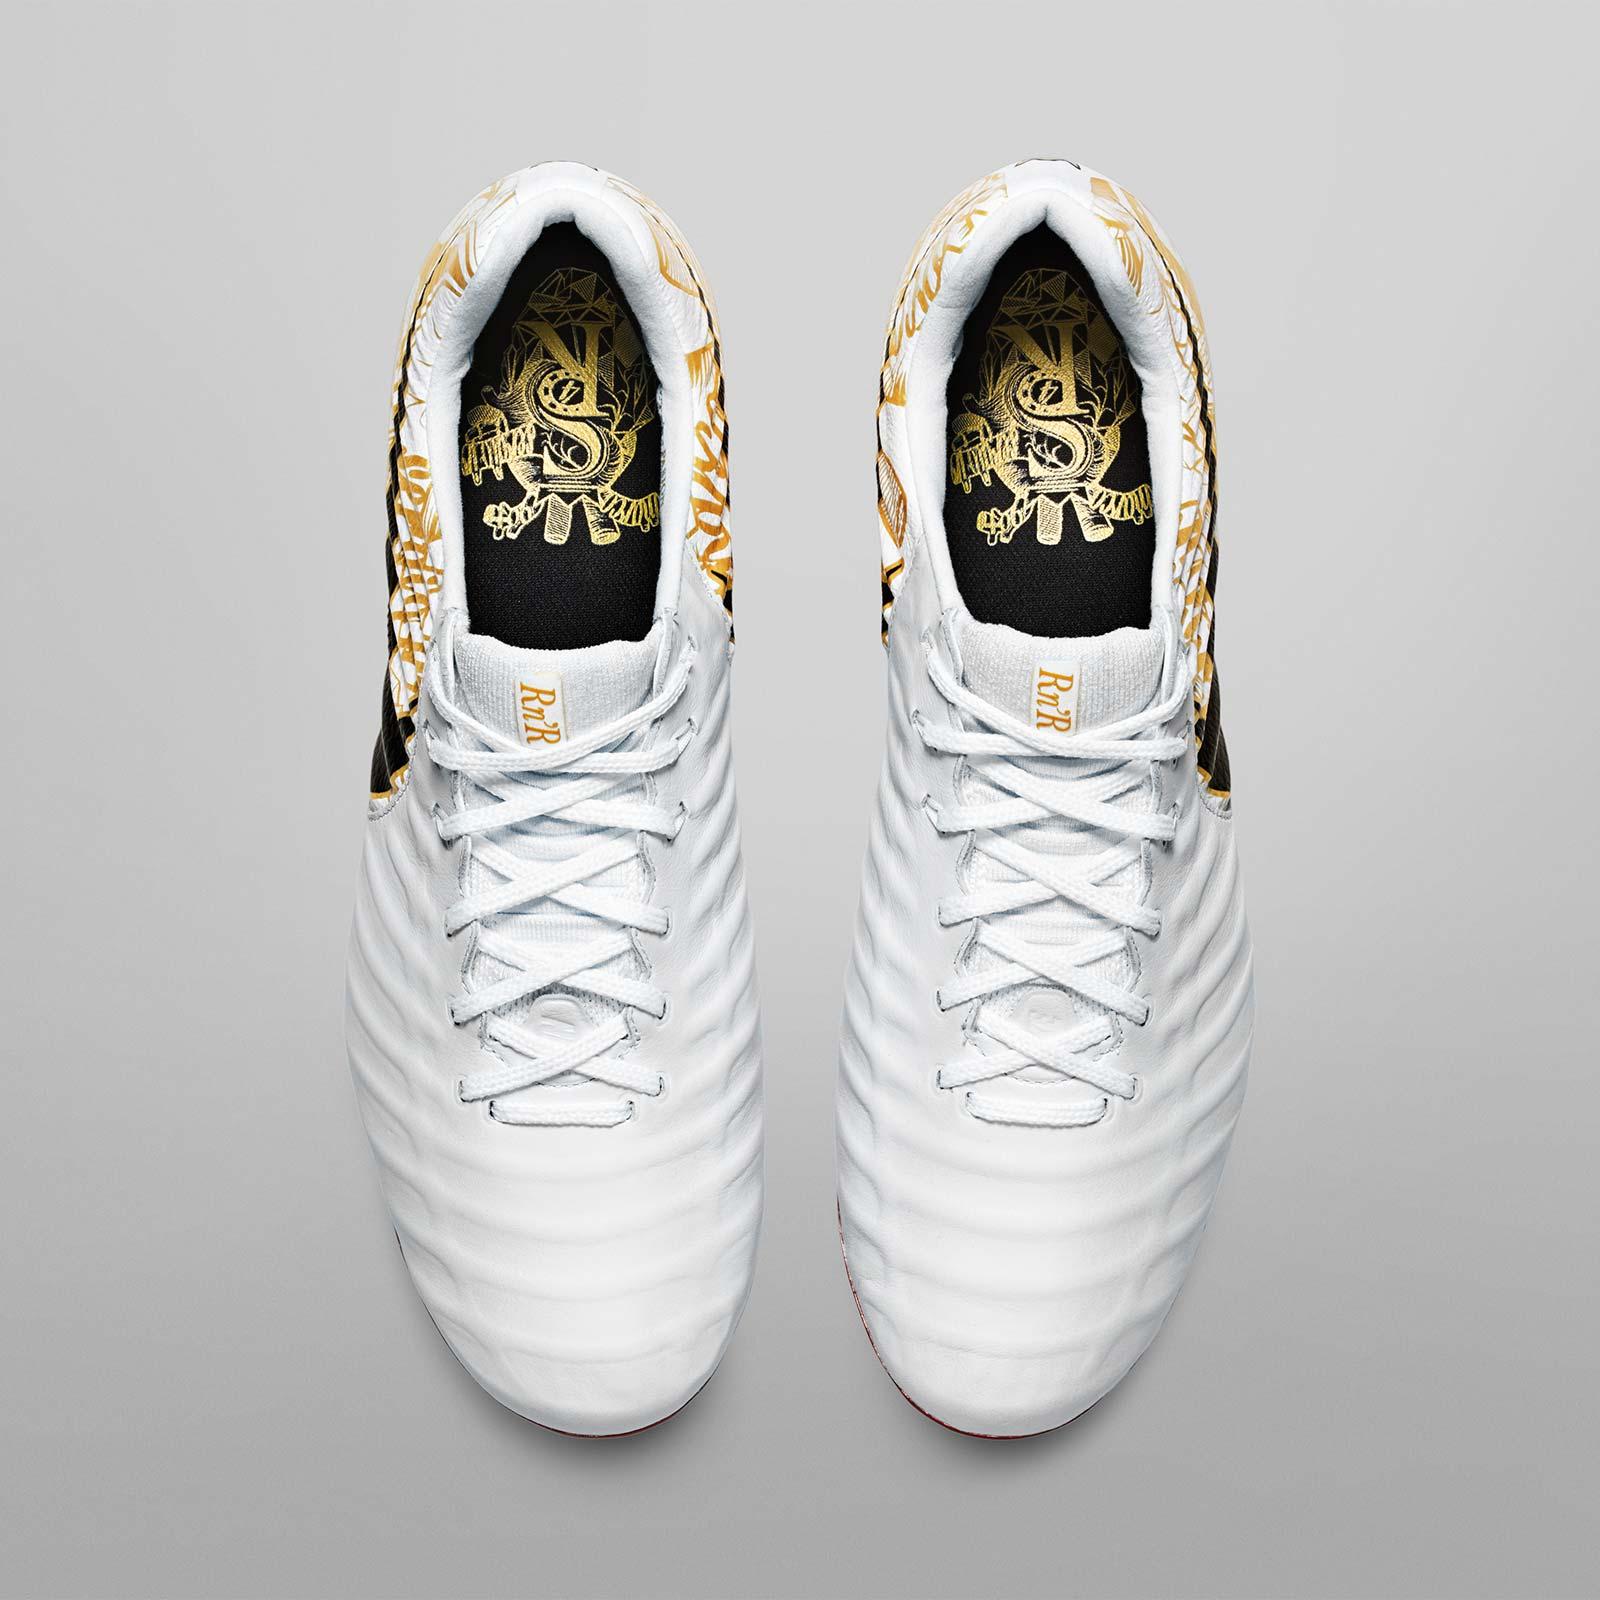 Novinky Nike Tiempo Legend VII Sergio Ramos shora